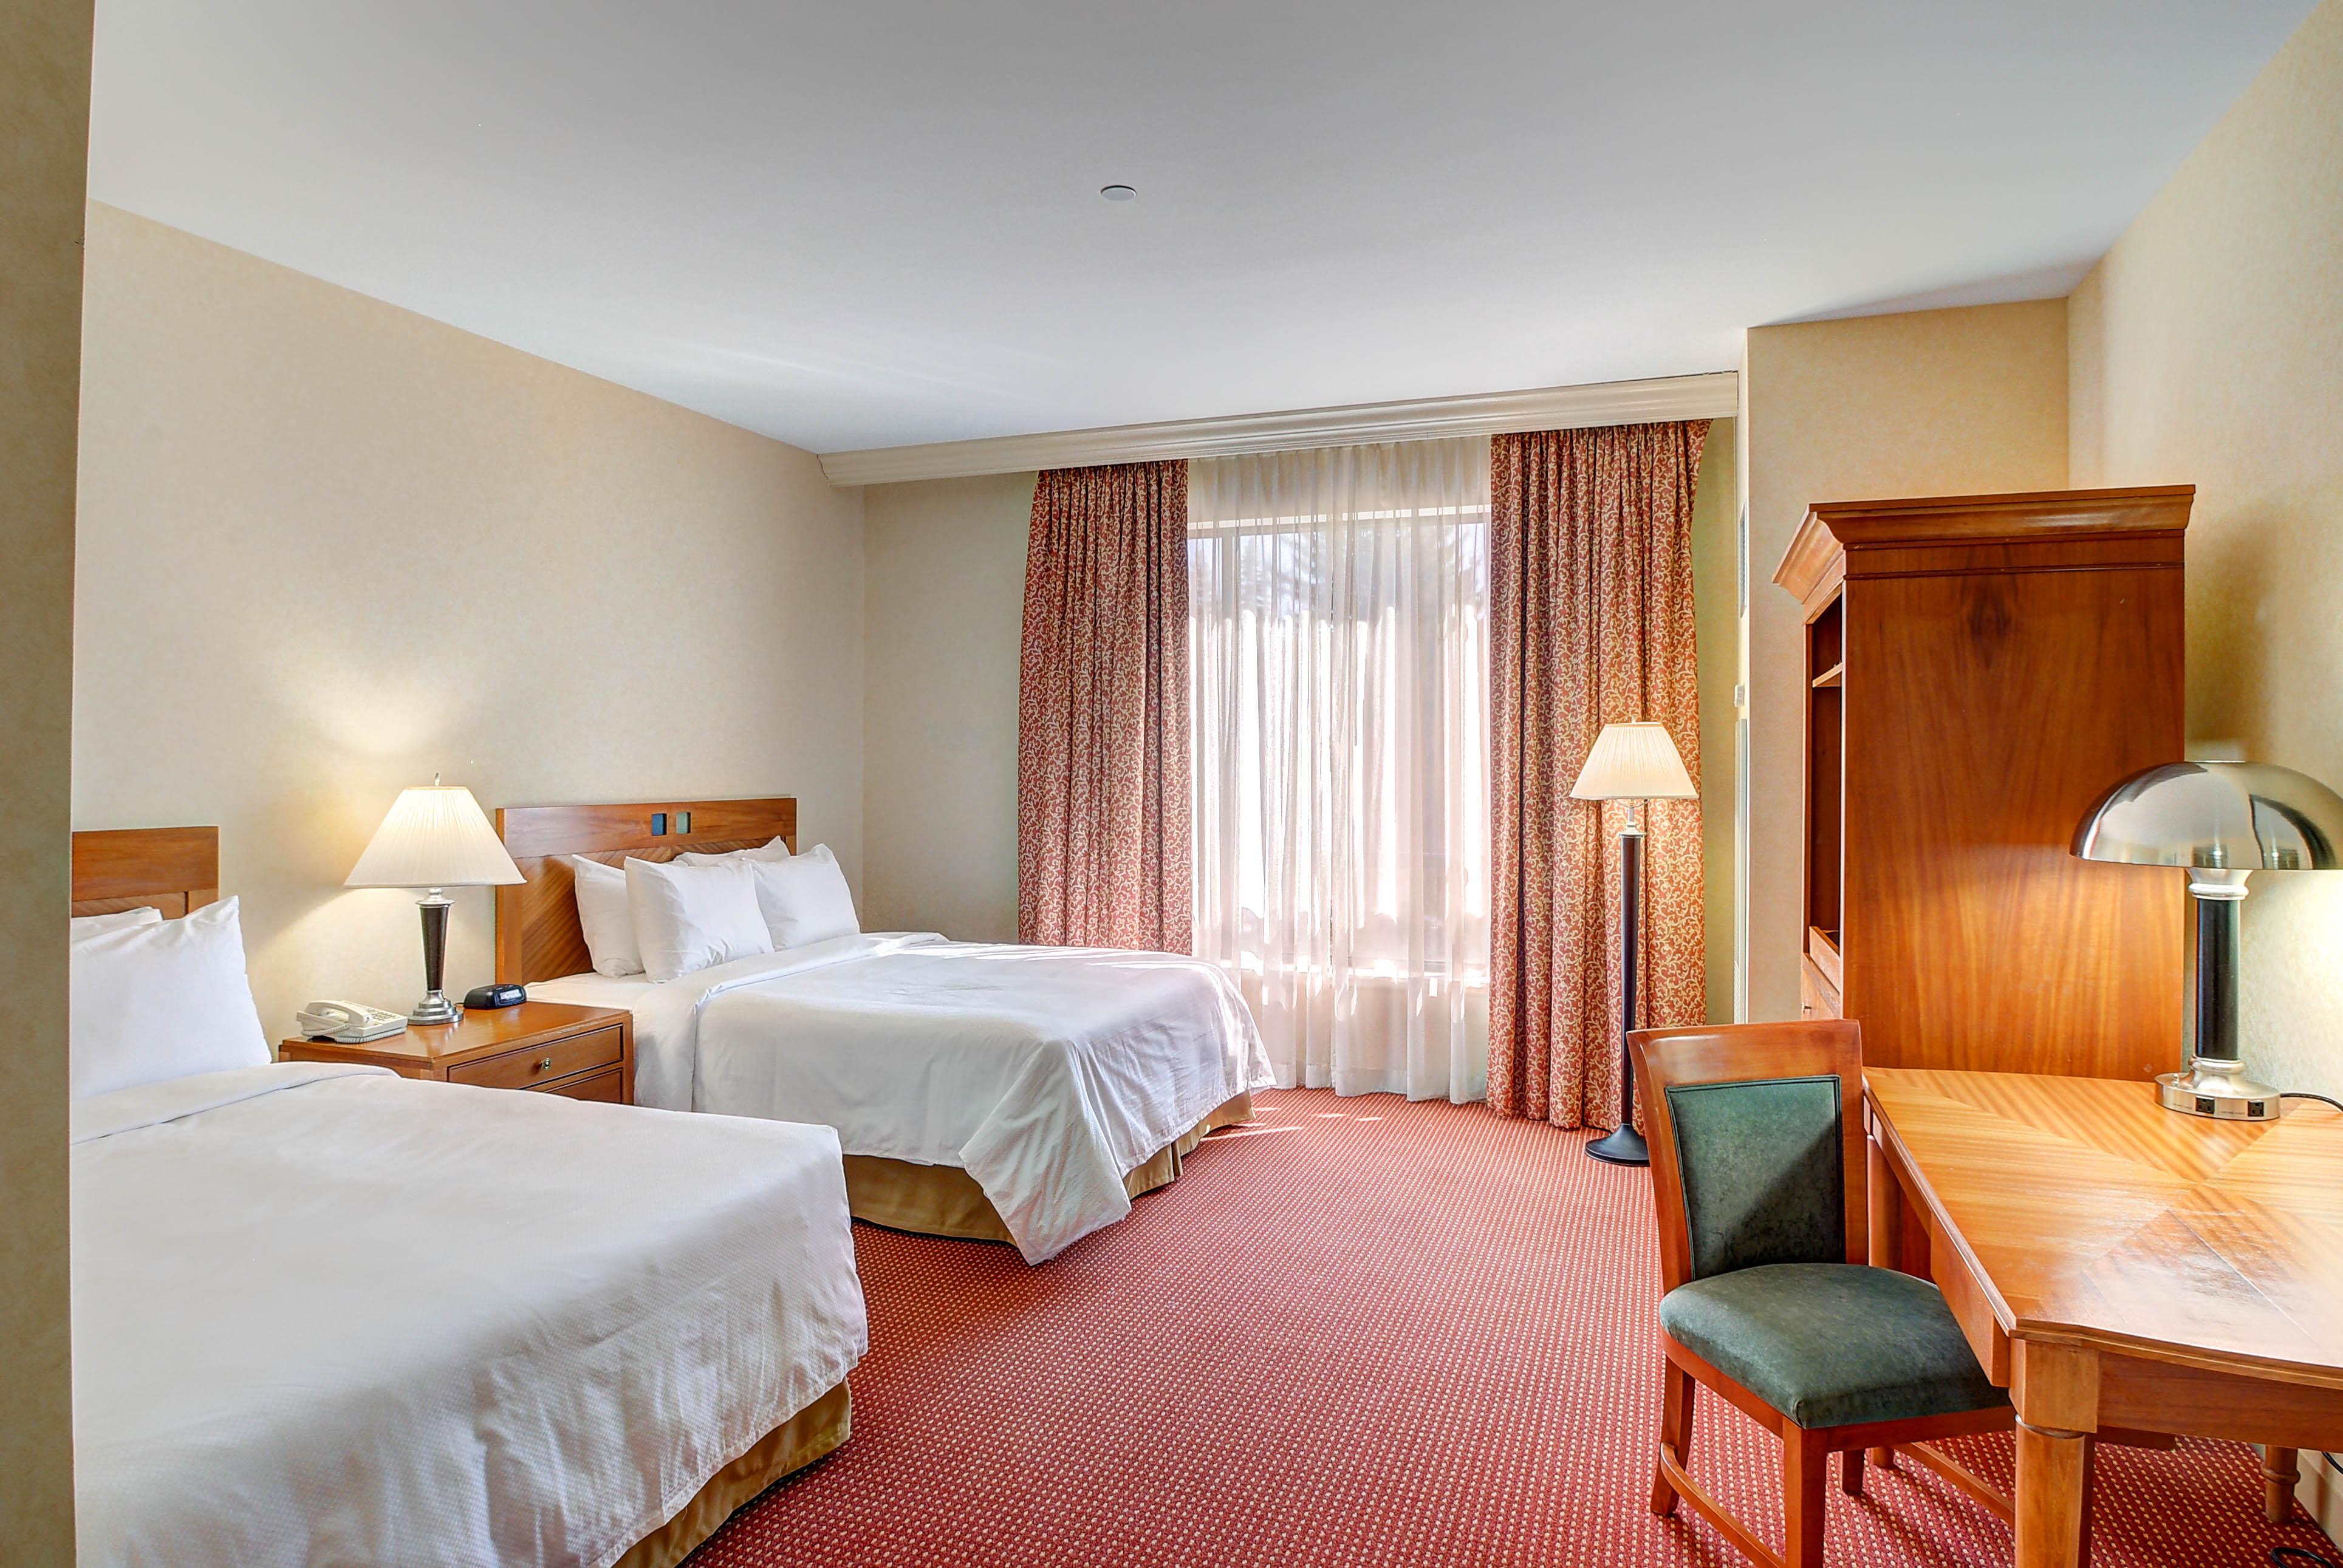 Southbridge Hotel & Conference Center image 1